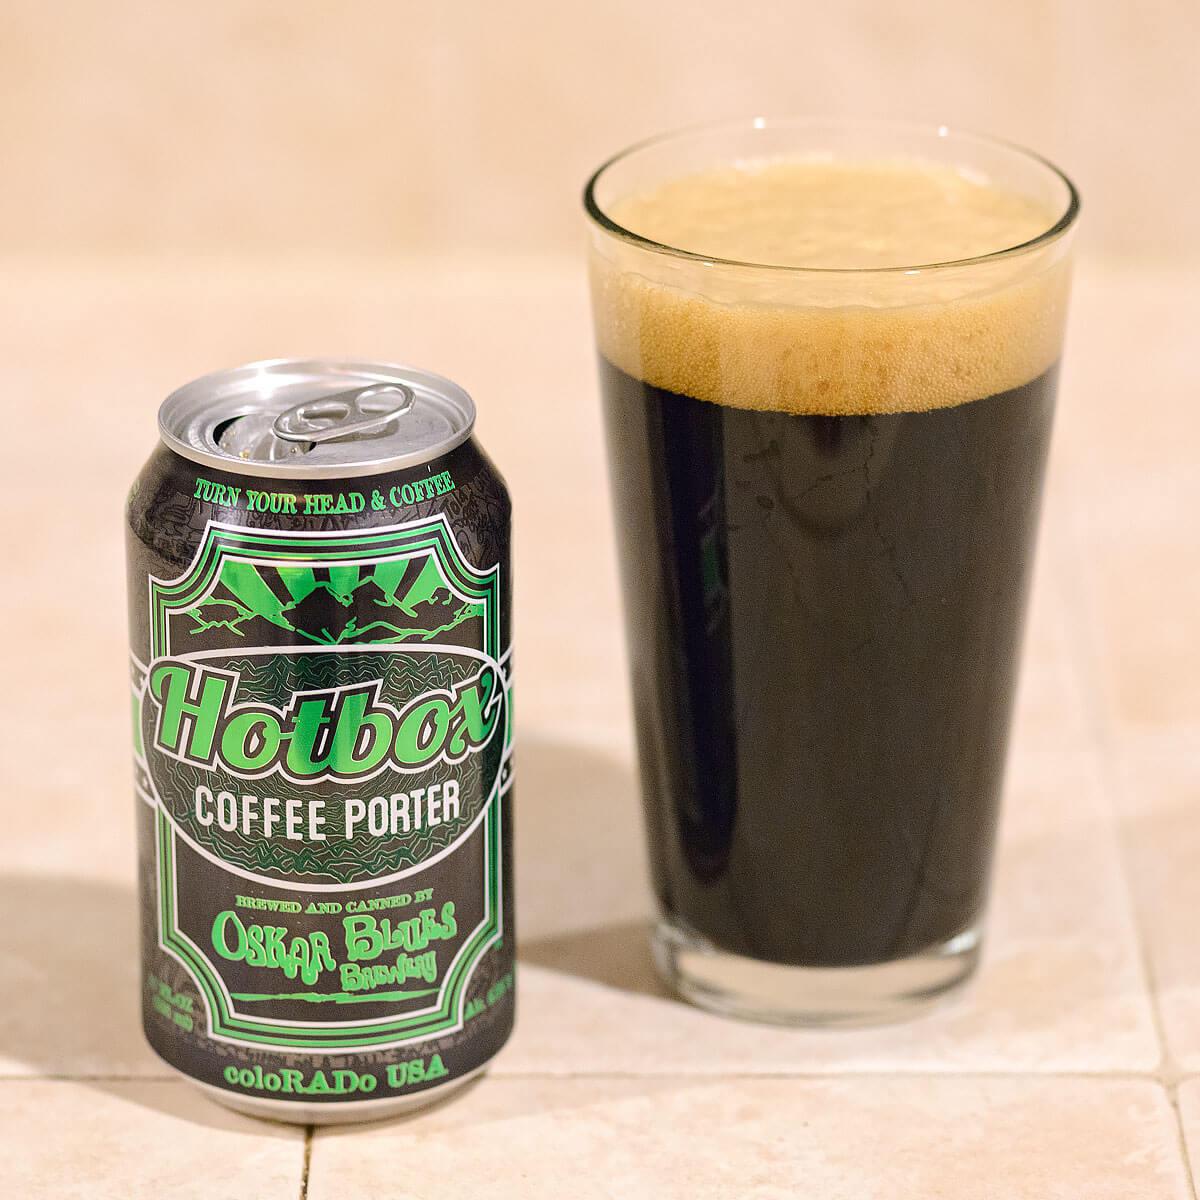 Hotbox Coffee Porter, an American Porter by Oskar Blues Brewery